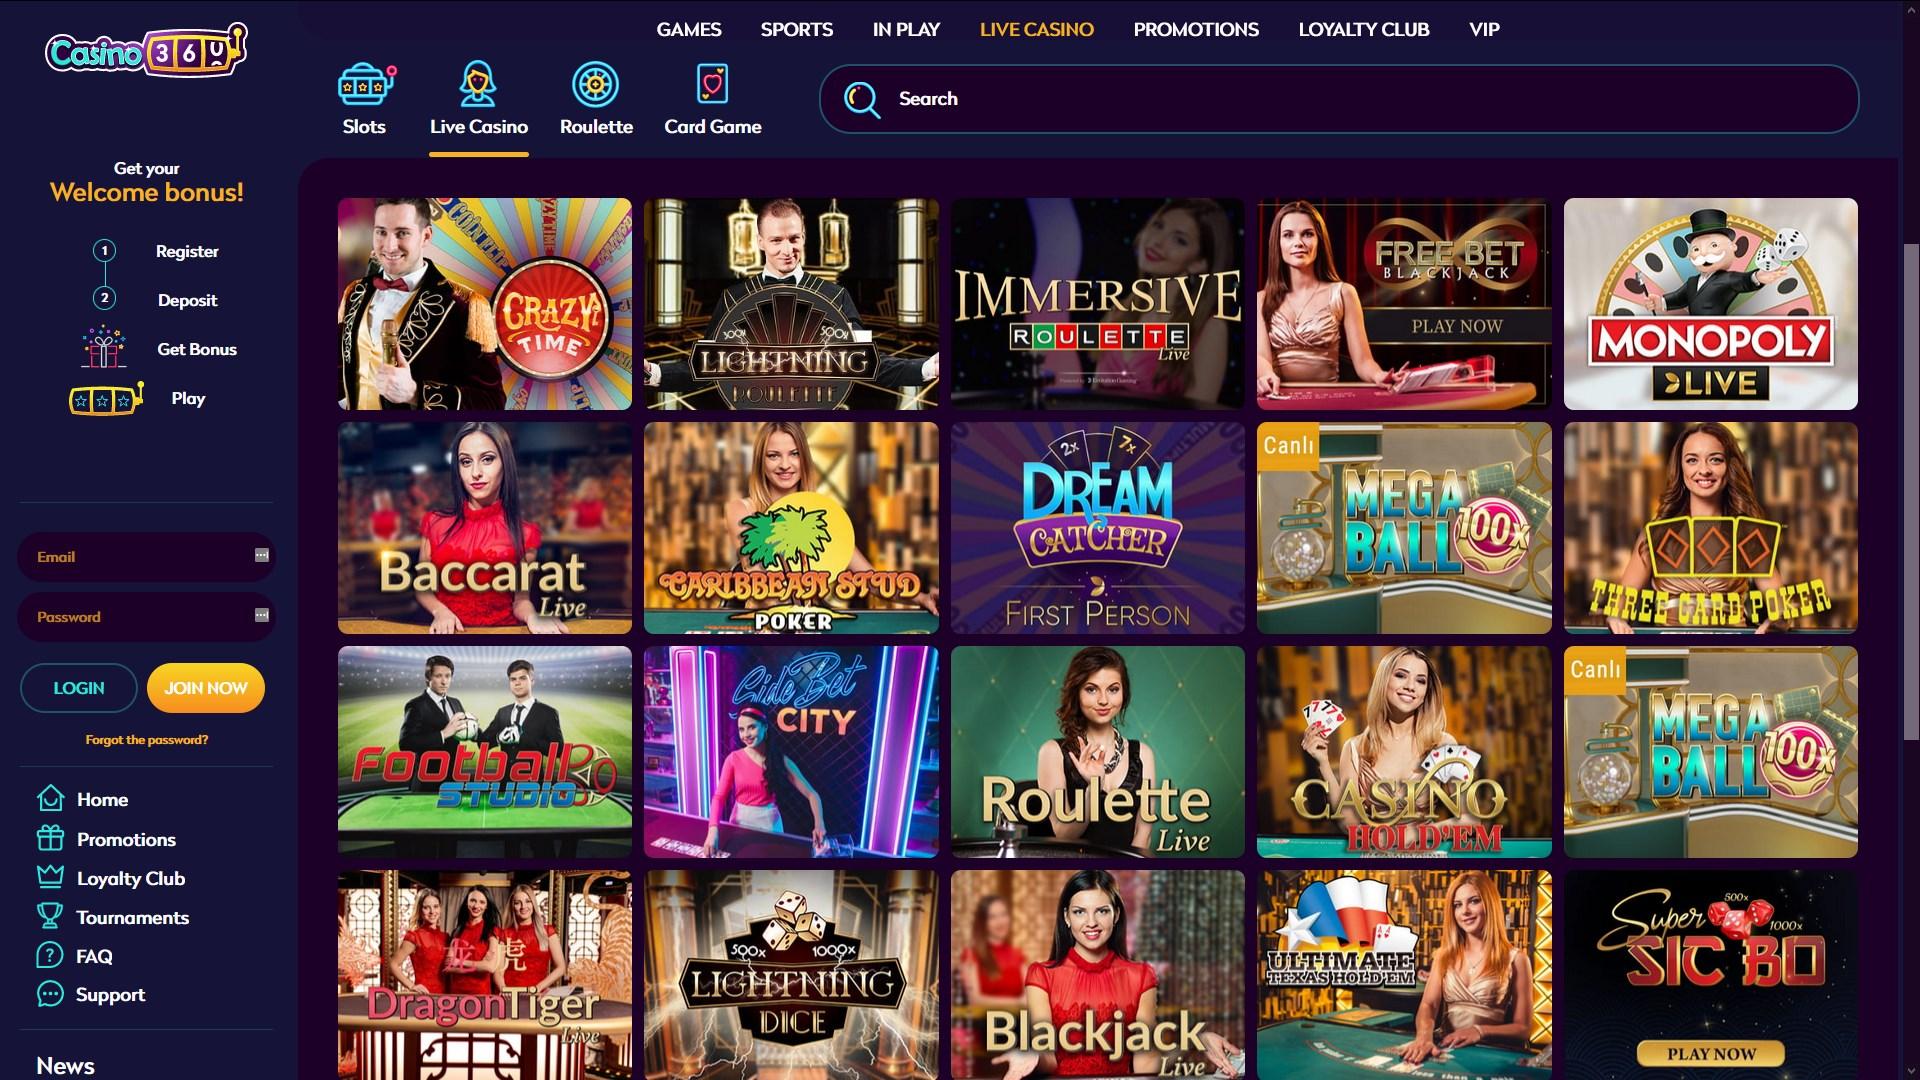 21-01-04-16-58-01-Live_games_at_Casino360_-_Mozilla_Firefox